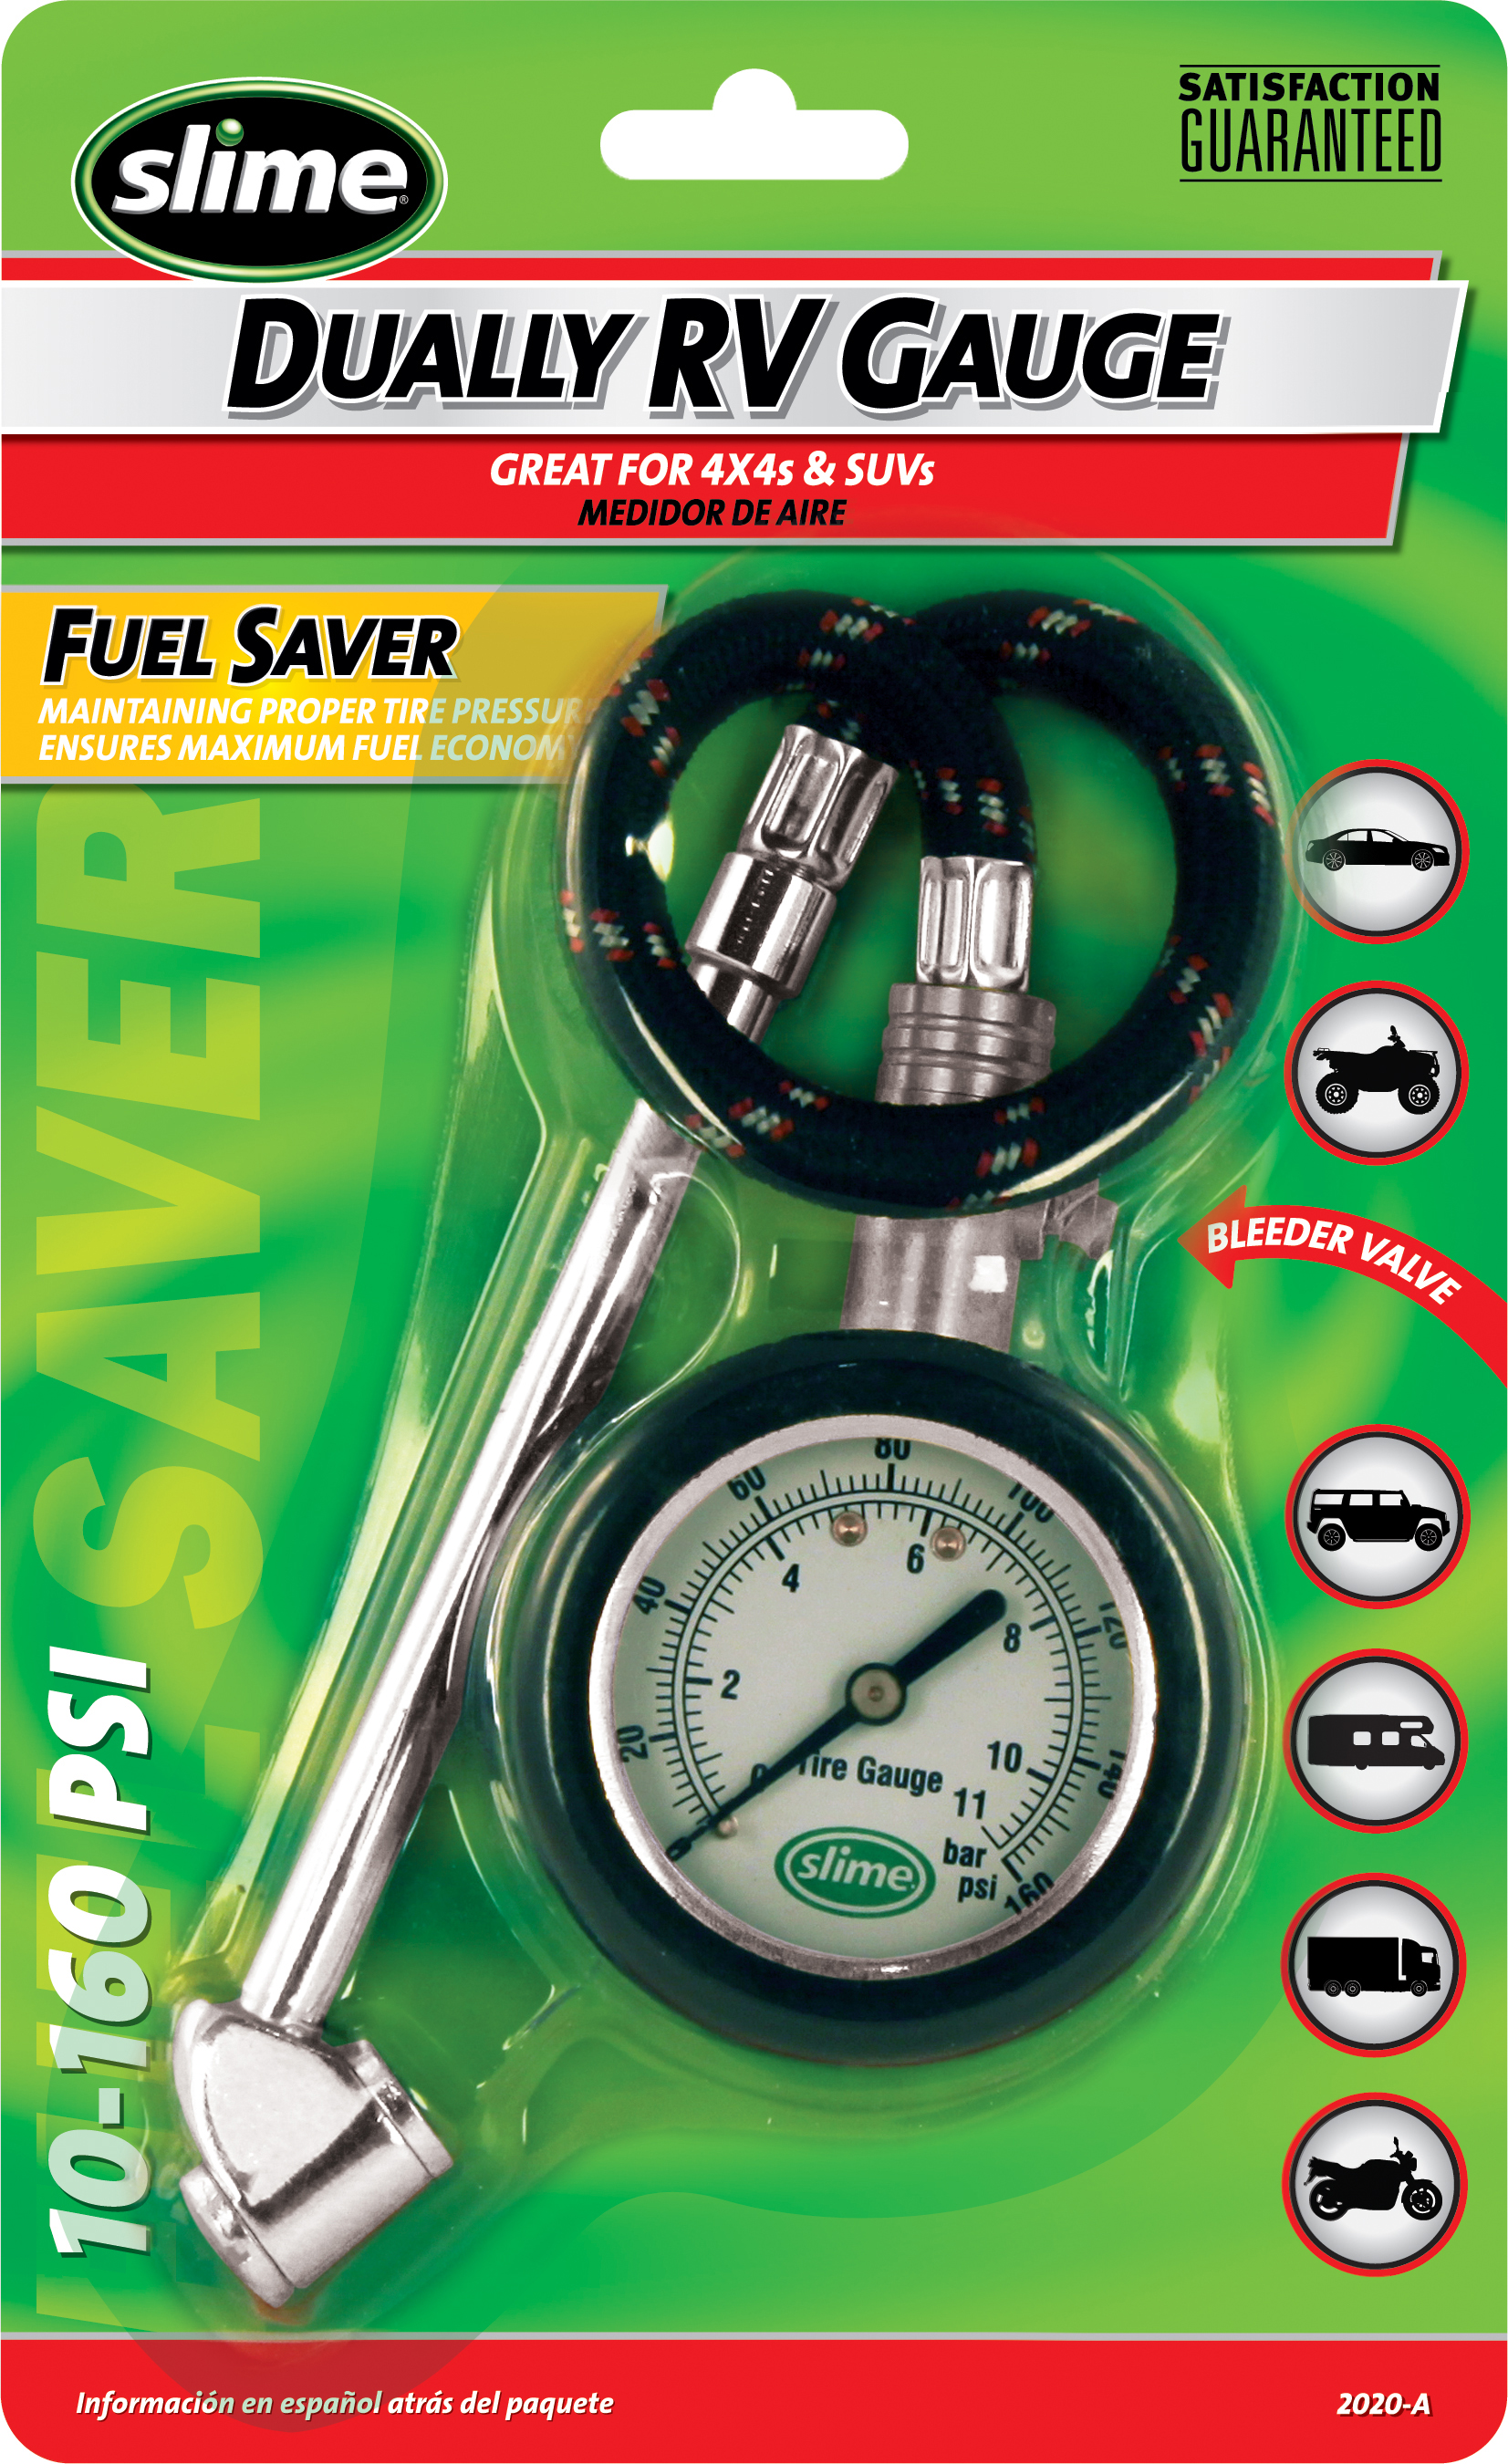 SLIME auto SUV 4x4 RV TIRE GAUGE 10-160 PSI AIR PRESSURE reset /& Bleeder Valve